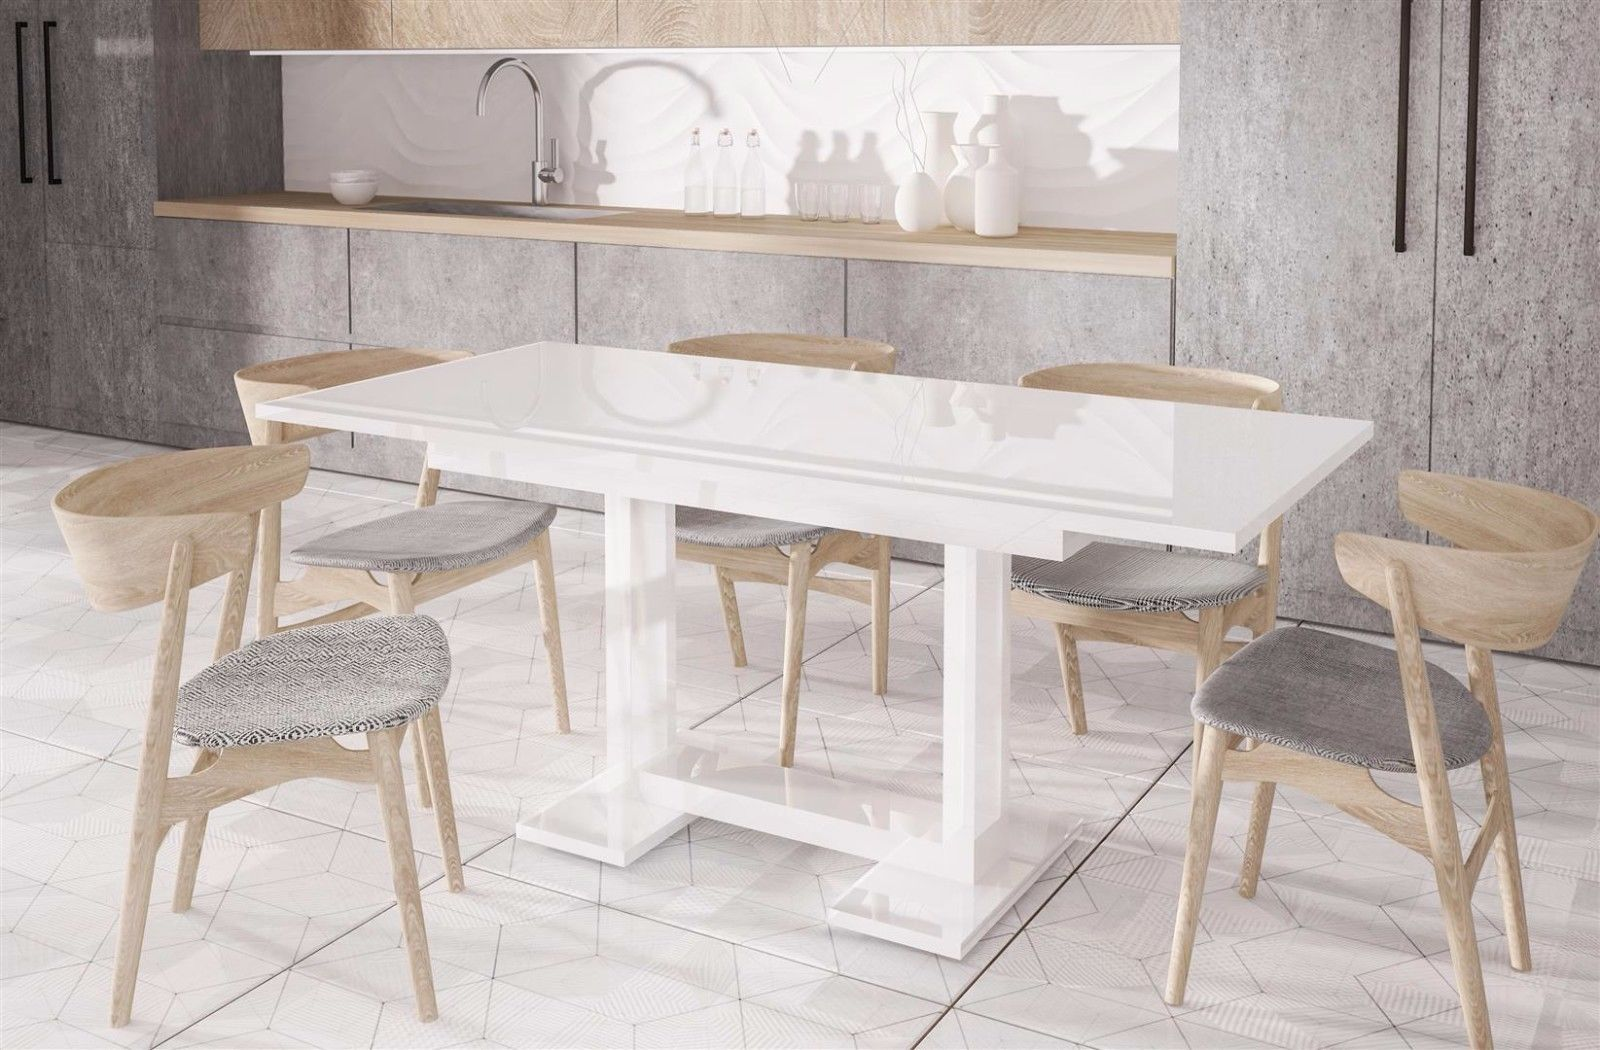 kche glas free interessant schne dekoration kche rckwand kche glas schn kche kunststoff with. Black Bedroom Furniture Sets. Home Design Ideas